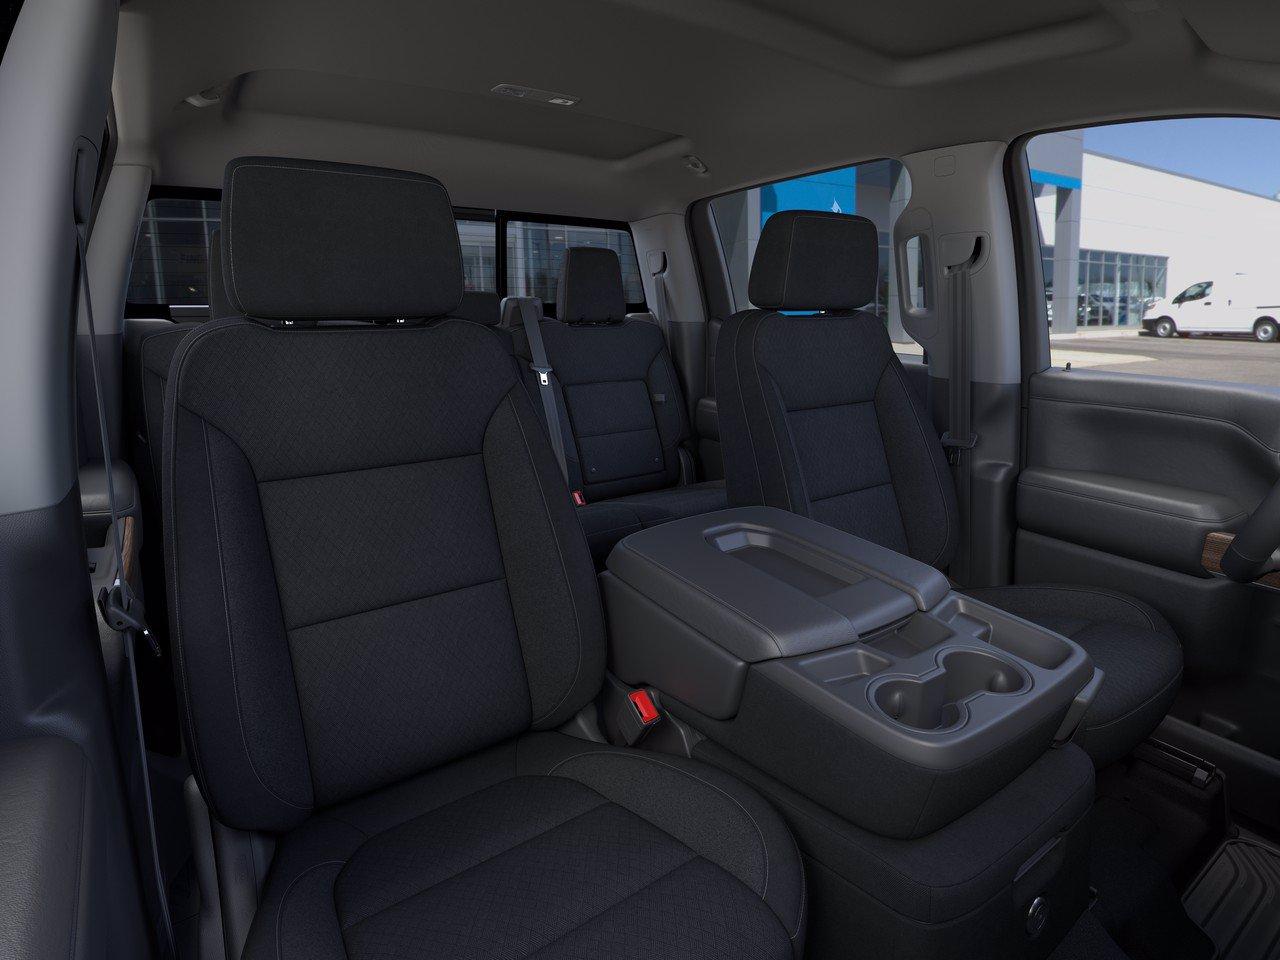 2020 Chevrolet Silverado 1500 Crew Cab 4x4, Pickup #C201430 - photo 11